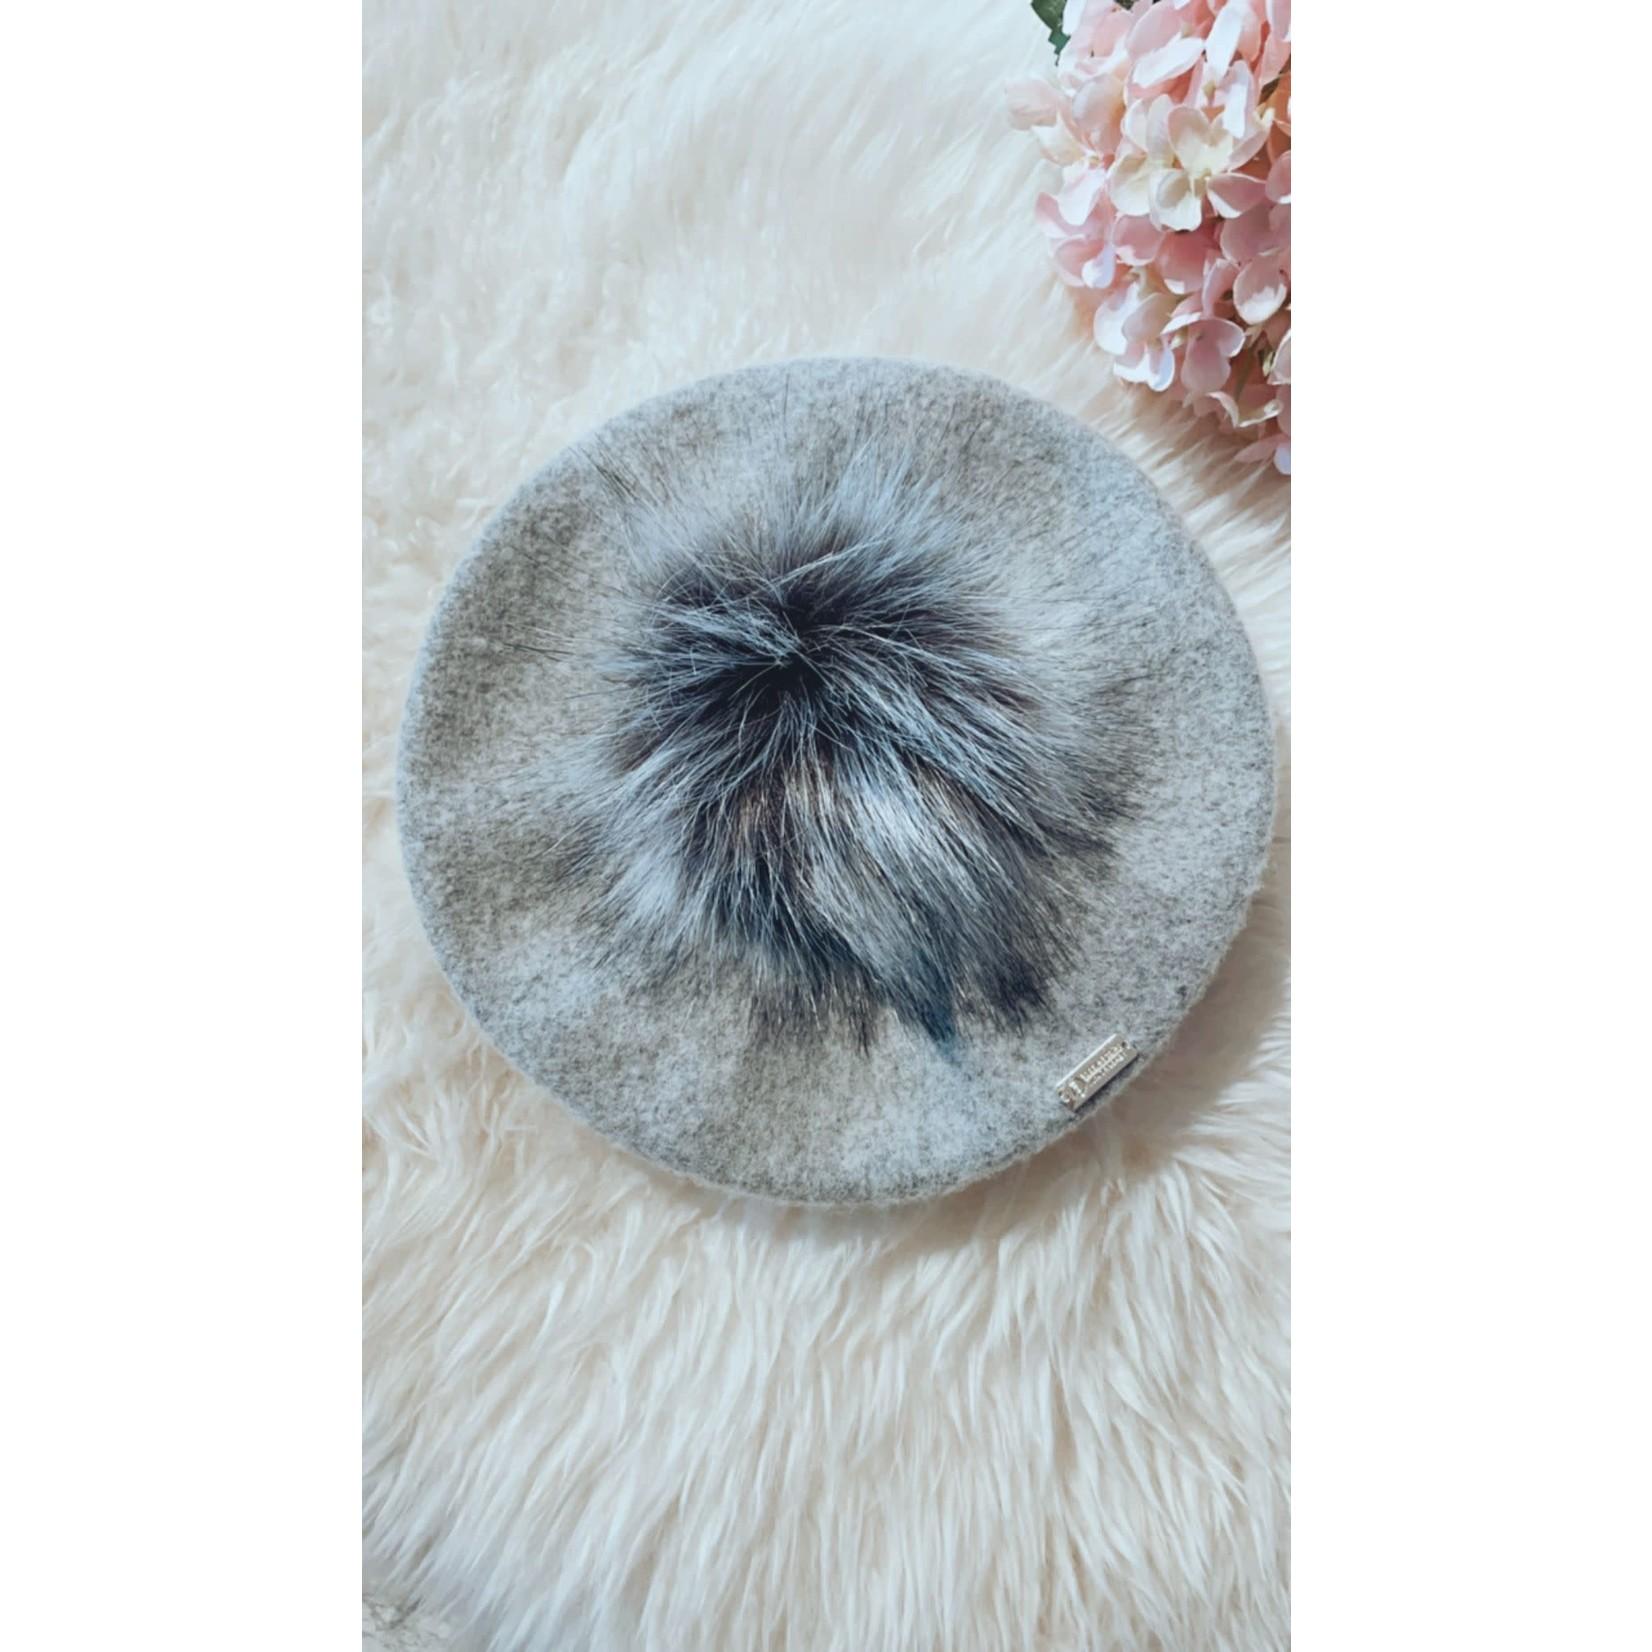 Hat Gray - Pompom 1-5 year